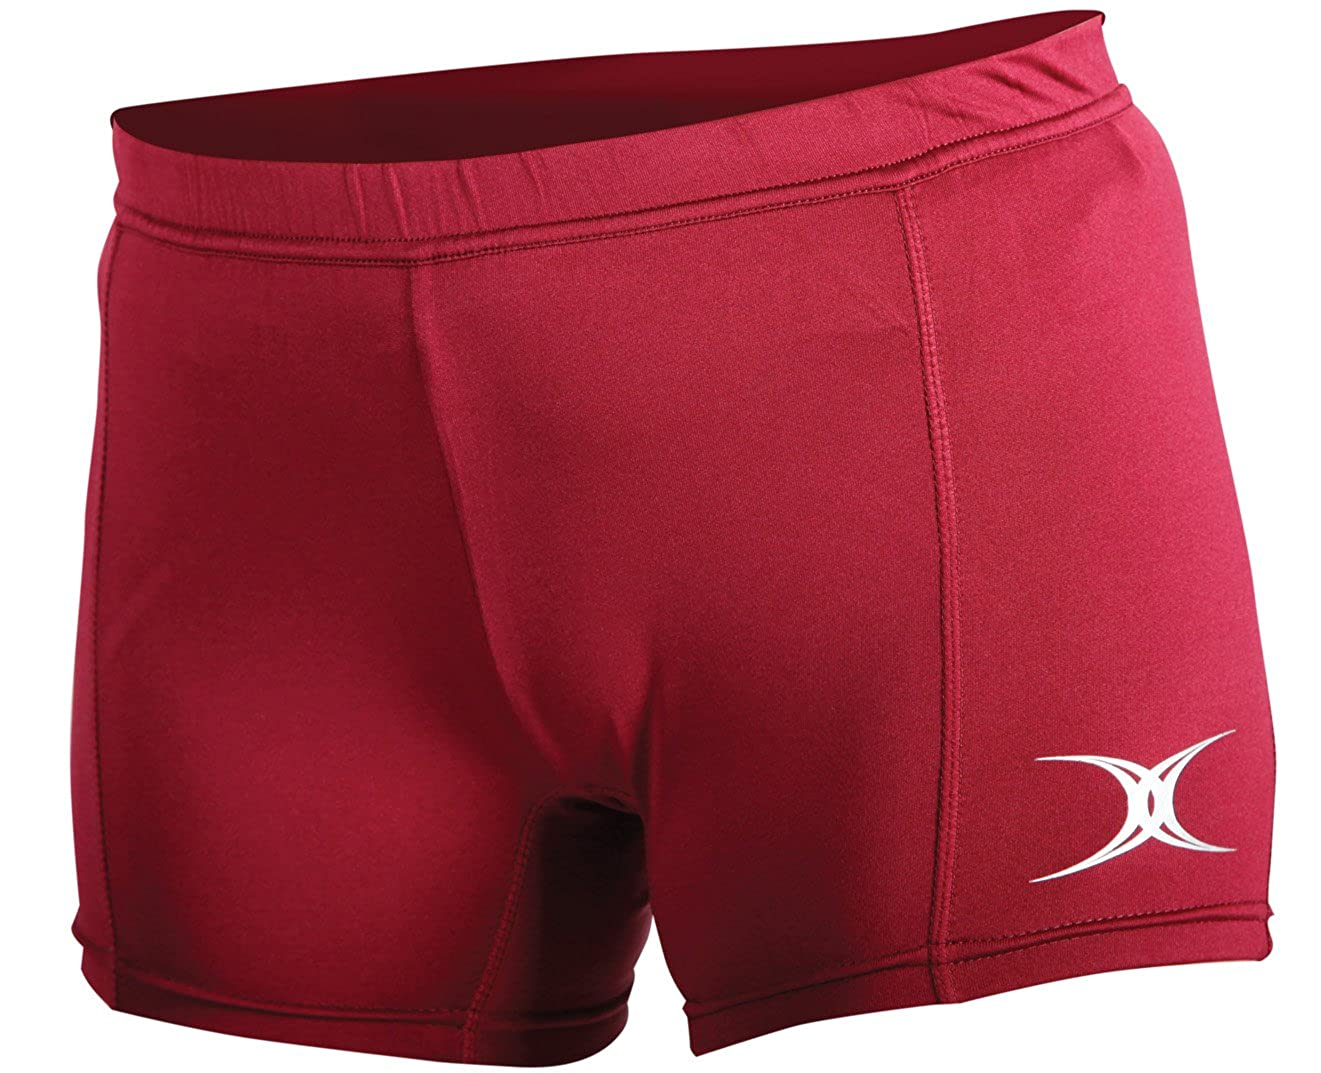 Gilbert Eclipse II Netball Shorts (Maroon Large)